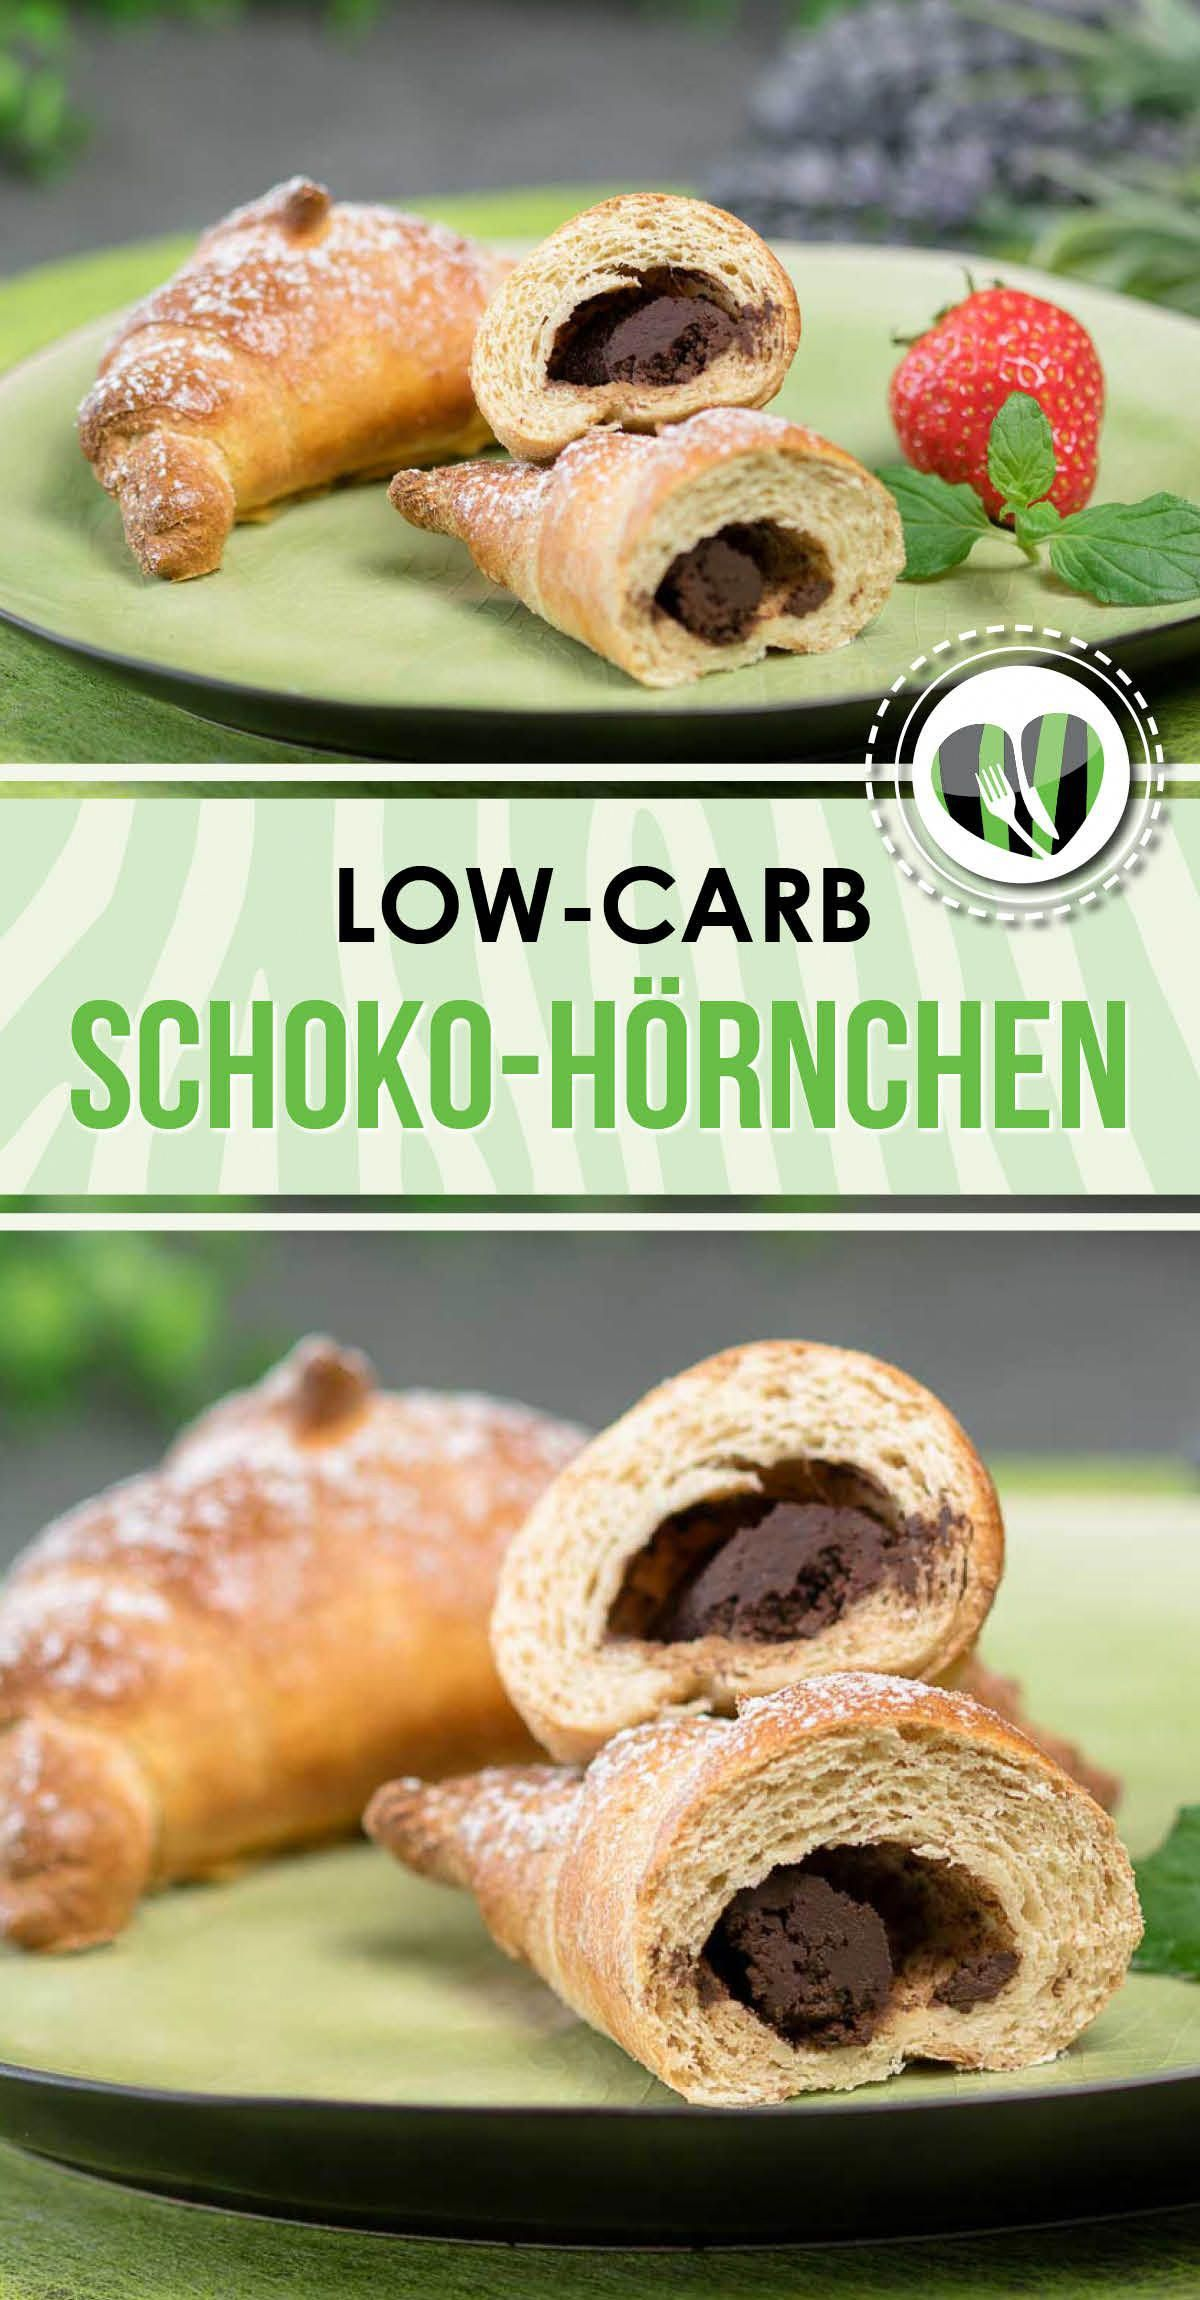 Low Carb No Sugar Foods List HealthyAndLowCarbRecipes in